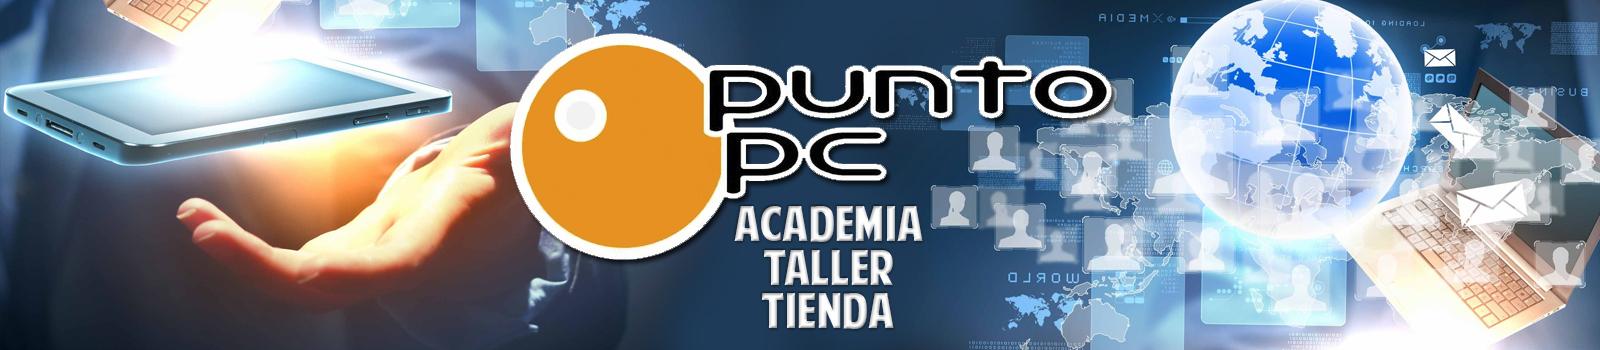 Academia de informática en Valladolid,taller informatico,taller de ordenadores,curso de windows